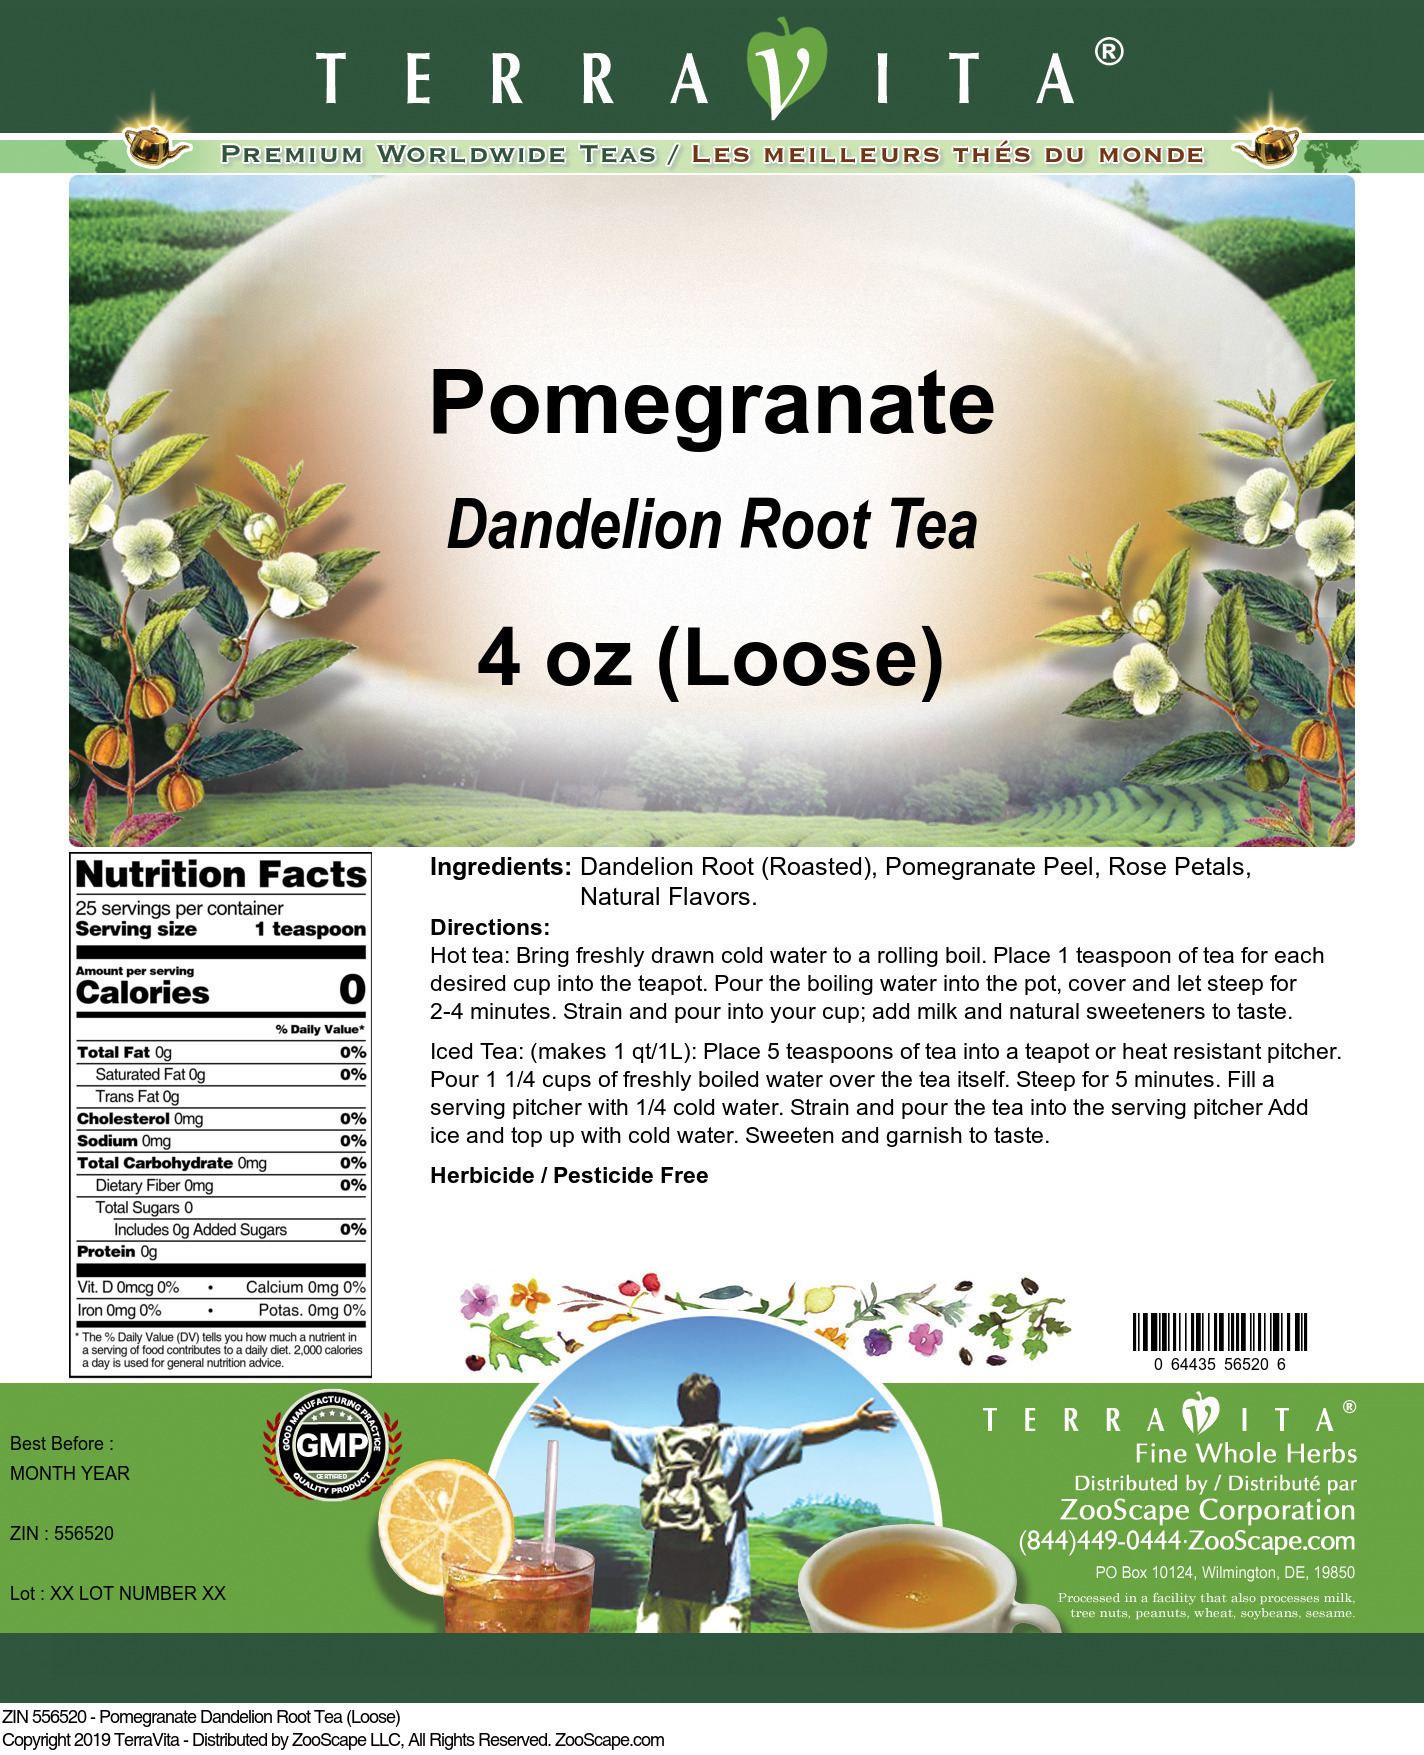 Pomegranate Dandelion Root